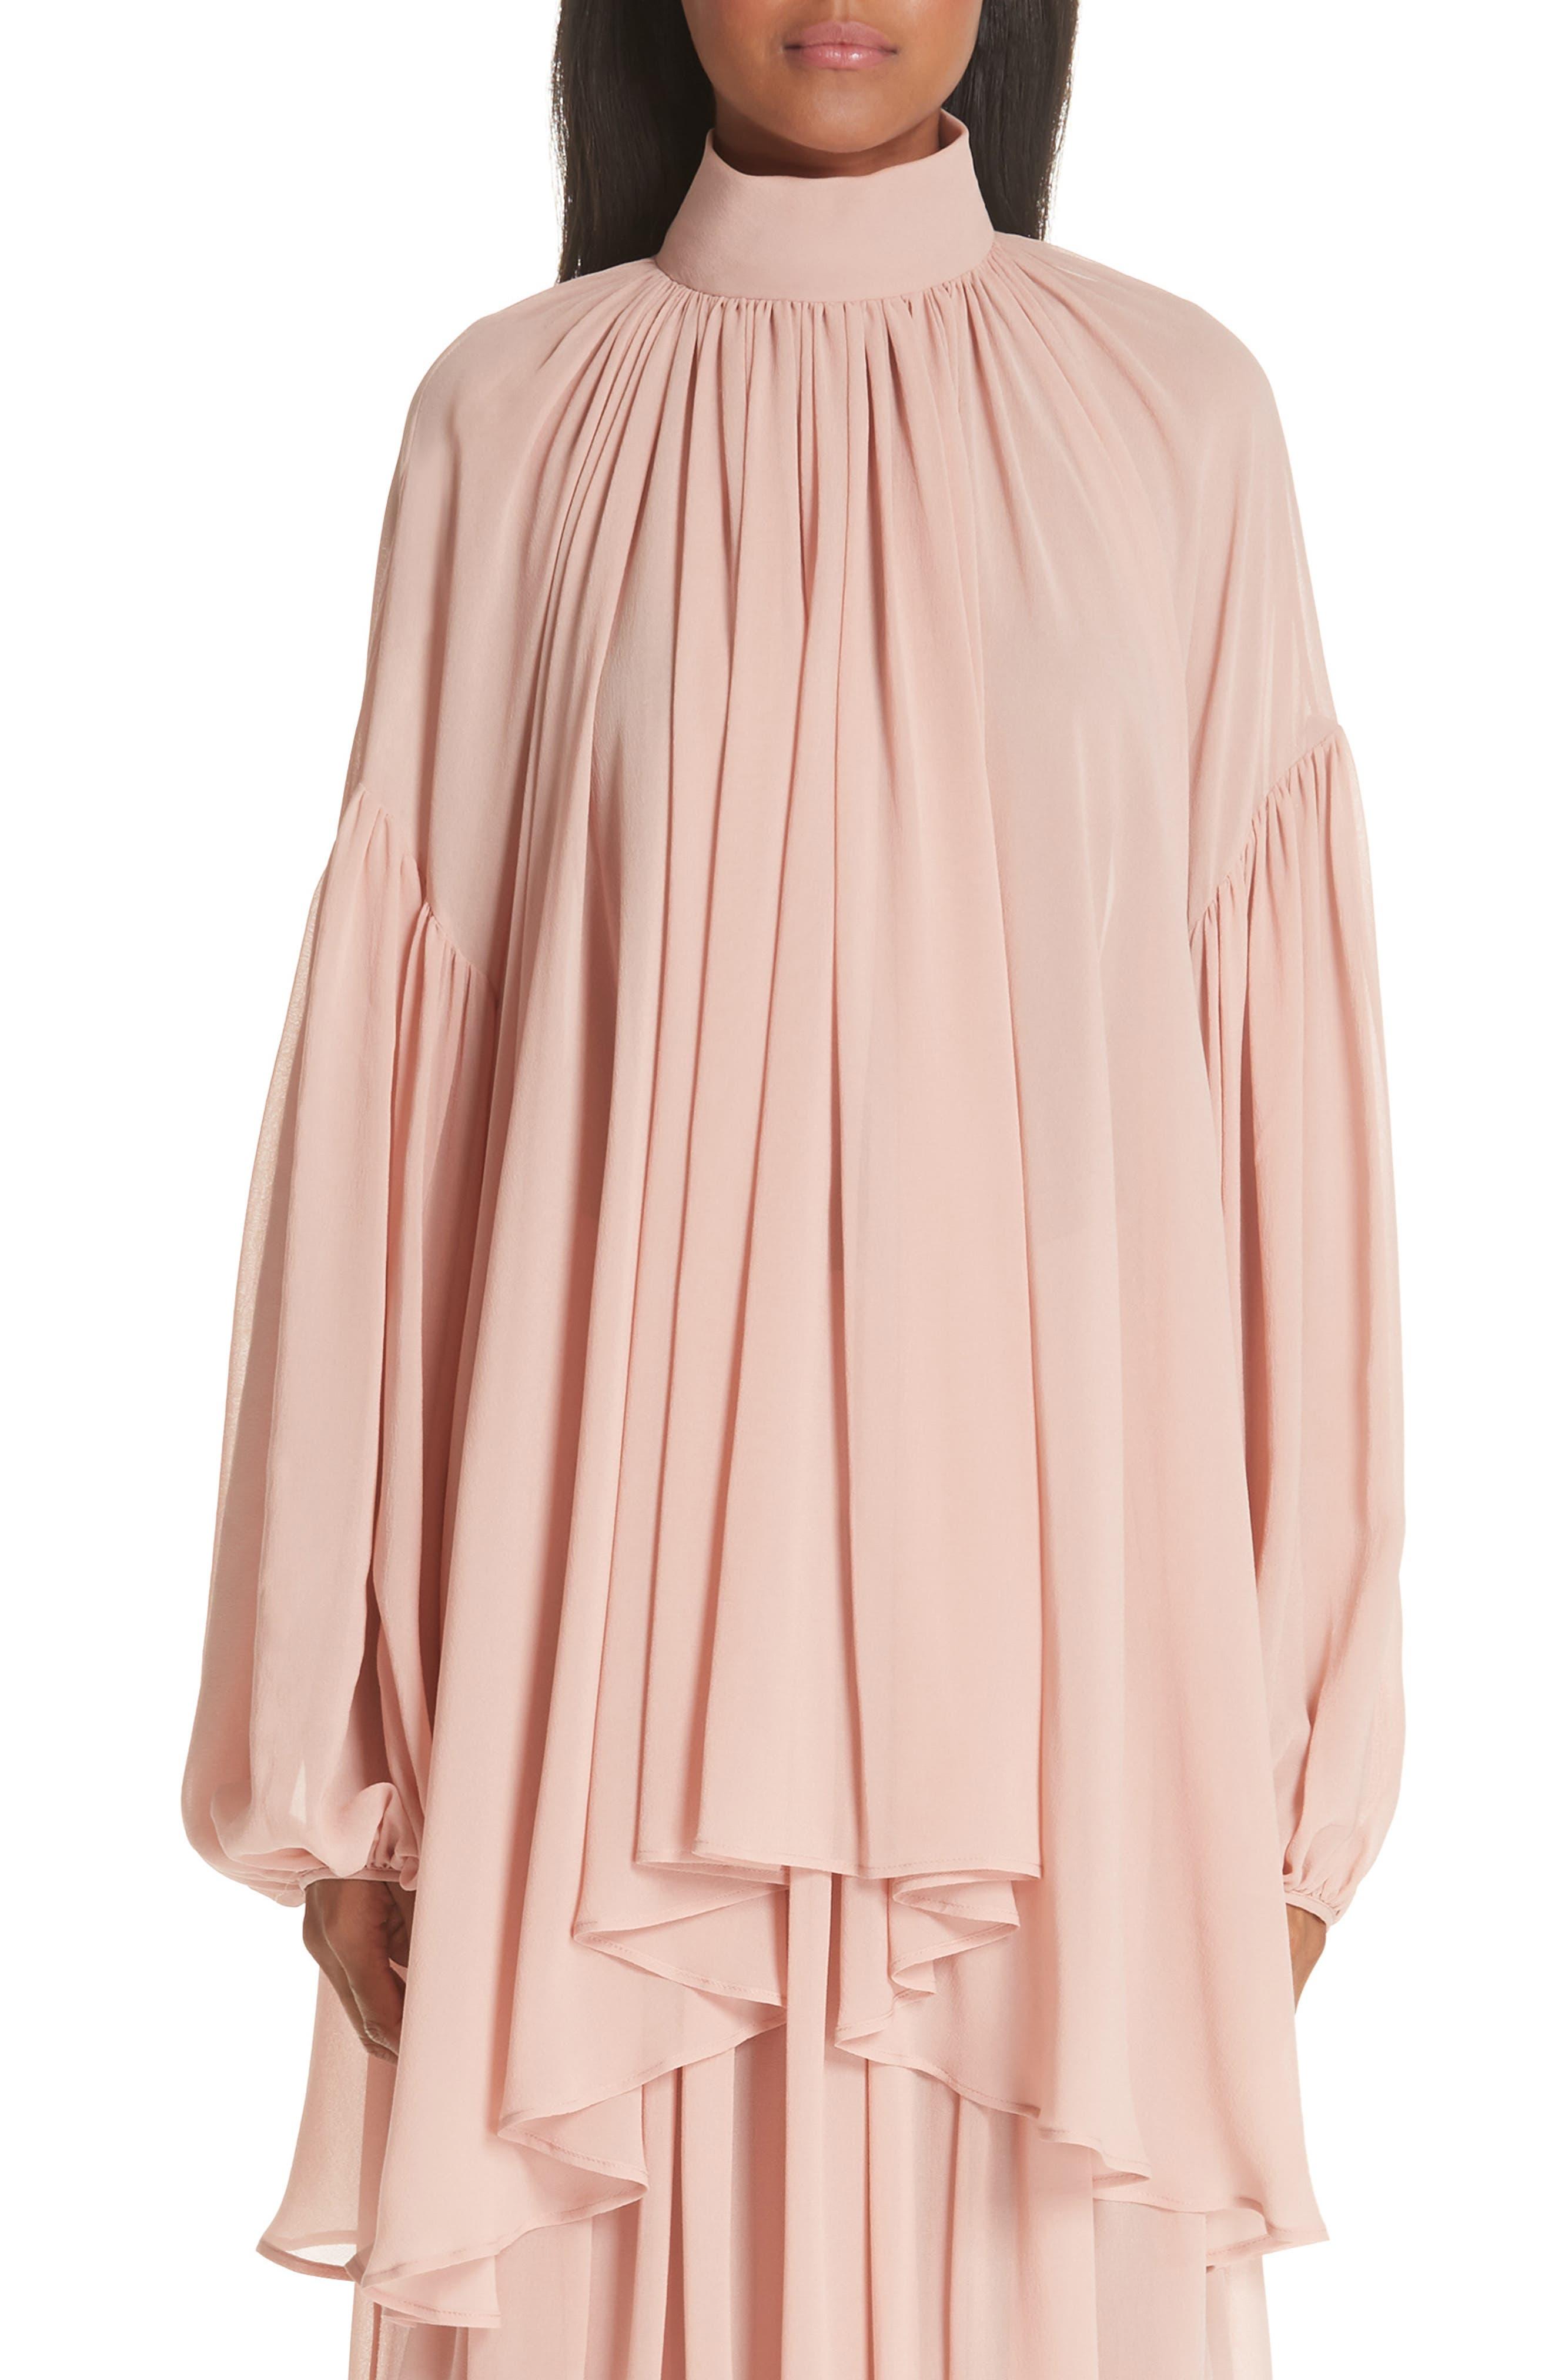 STELLA MCCARTNEY Tanya Gathered Silk Top, Main, color, 650